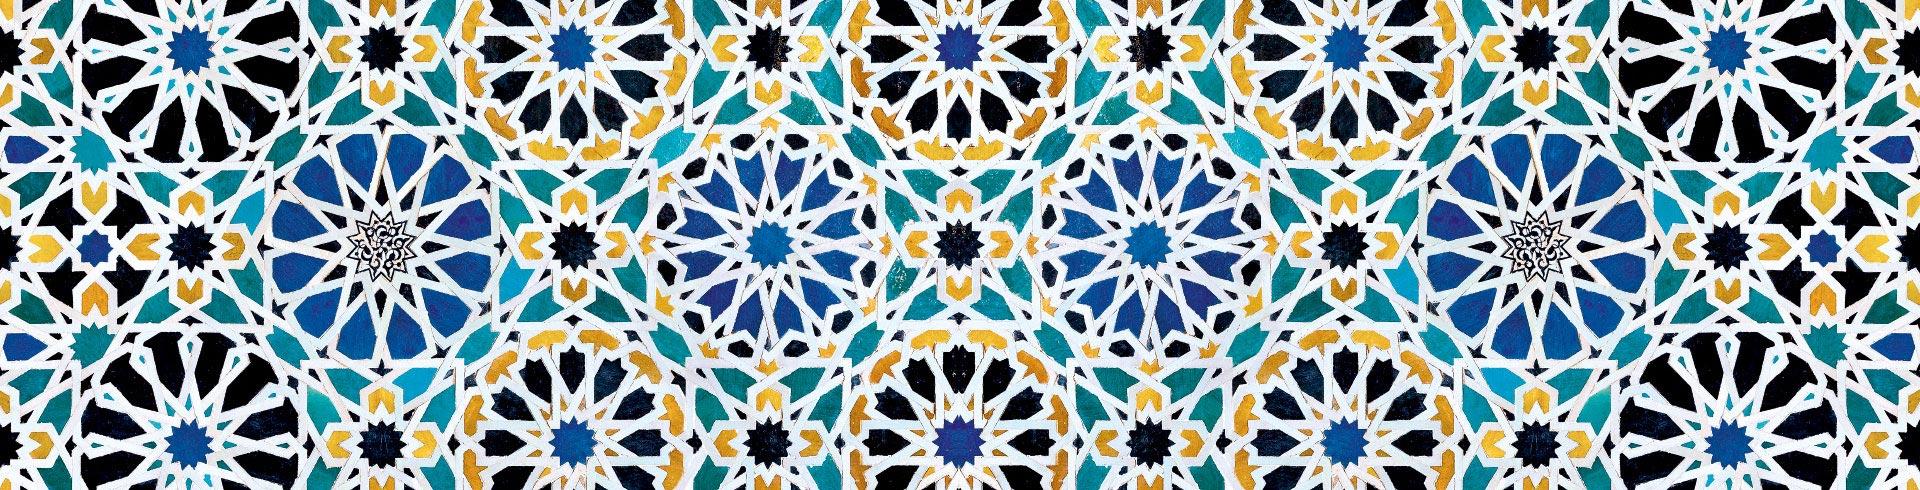 Azulejos de l'Alhambra de Grenade, la beauté de l'art nasride